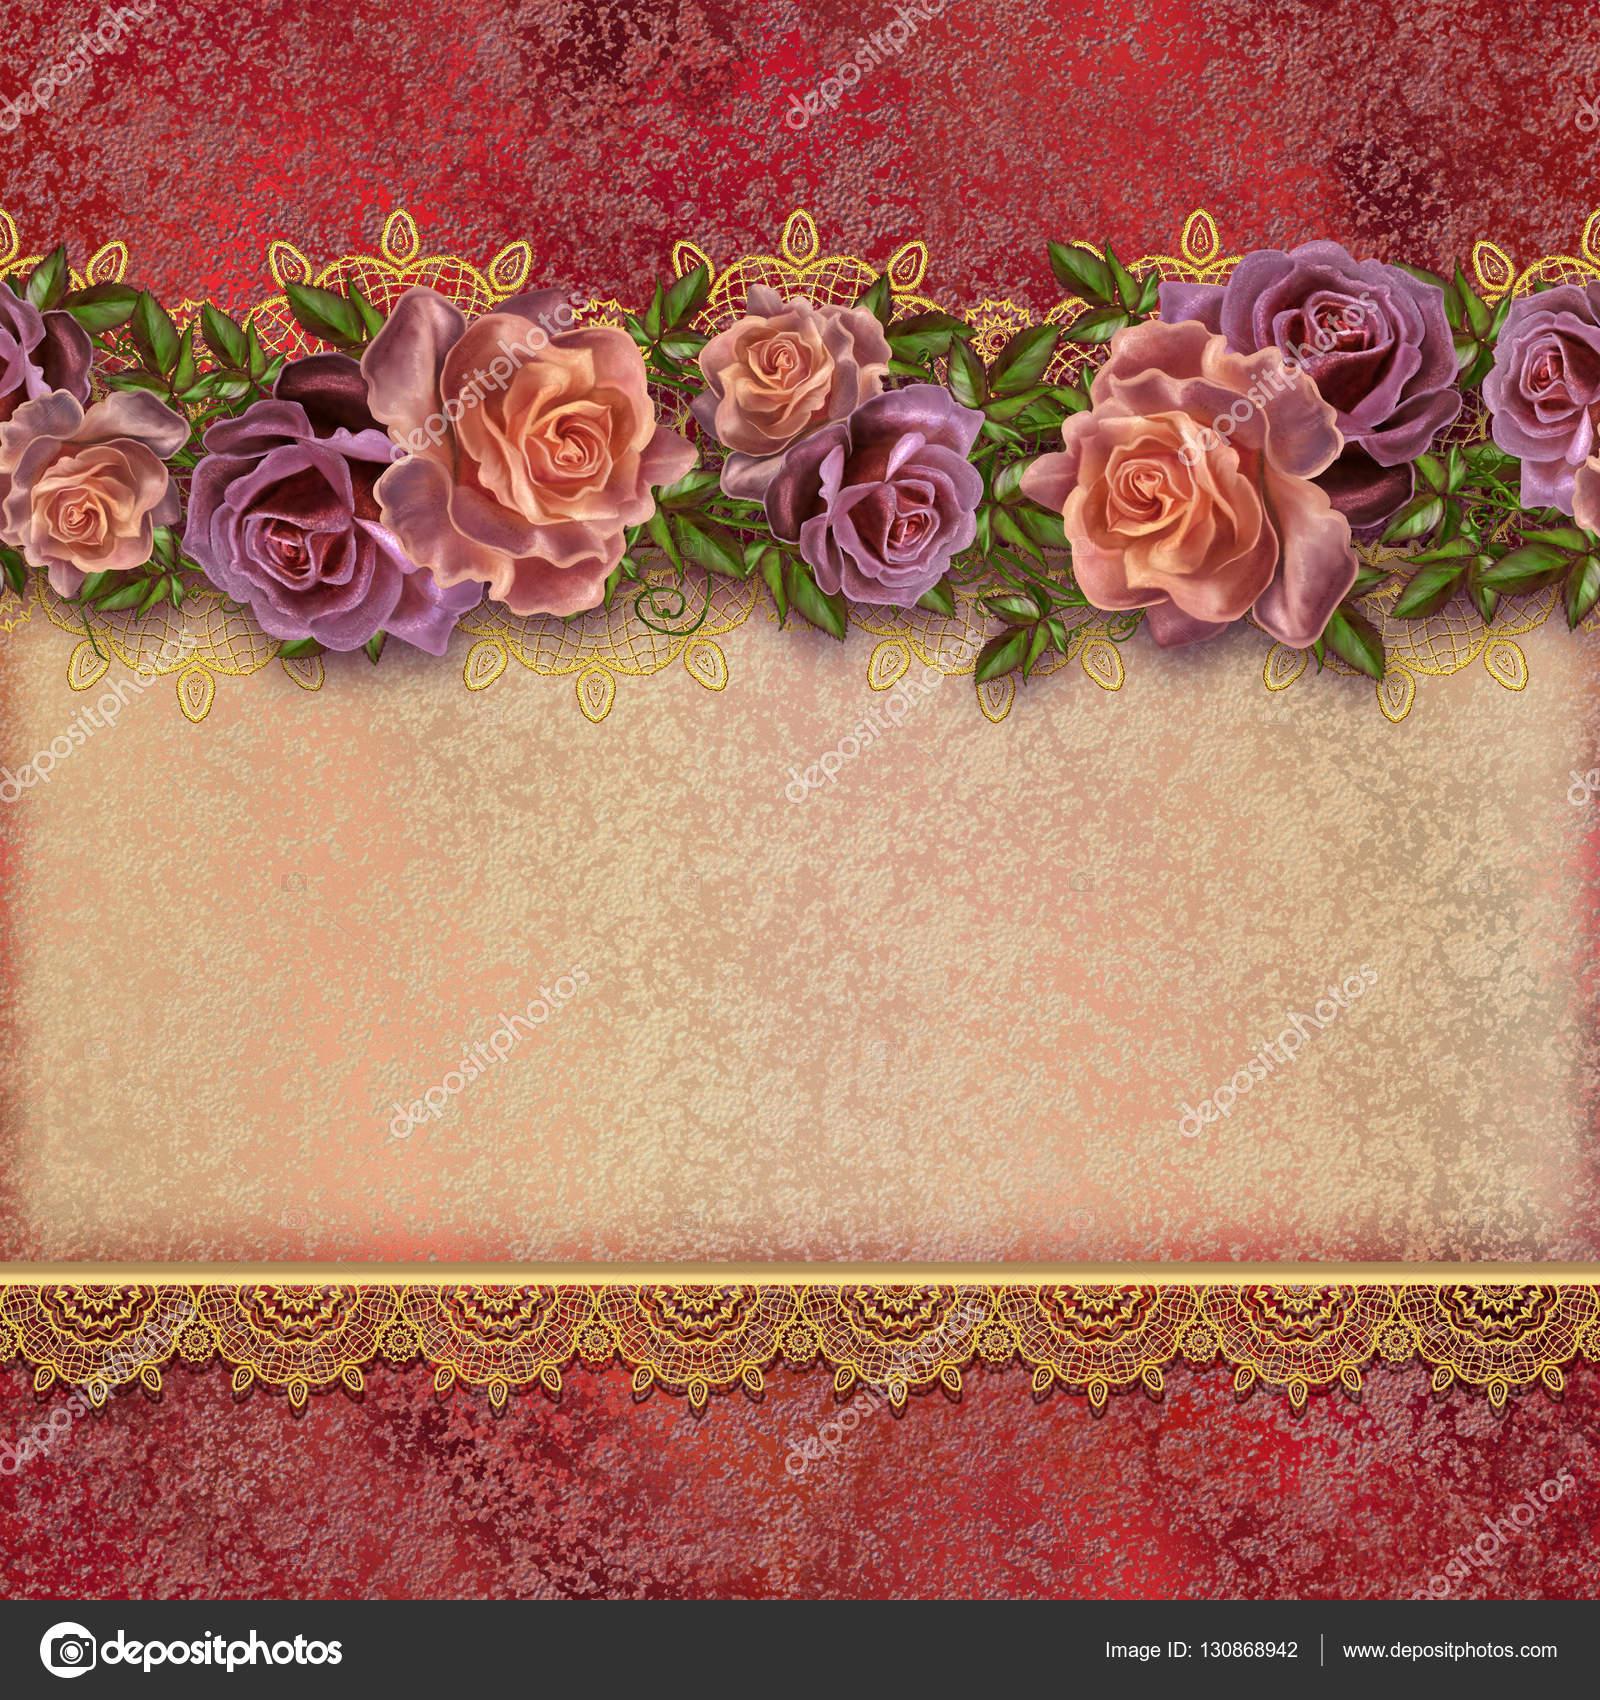 Fundo Dourado Vintage. Guirlandas De Flores De Rosas